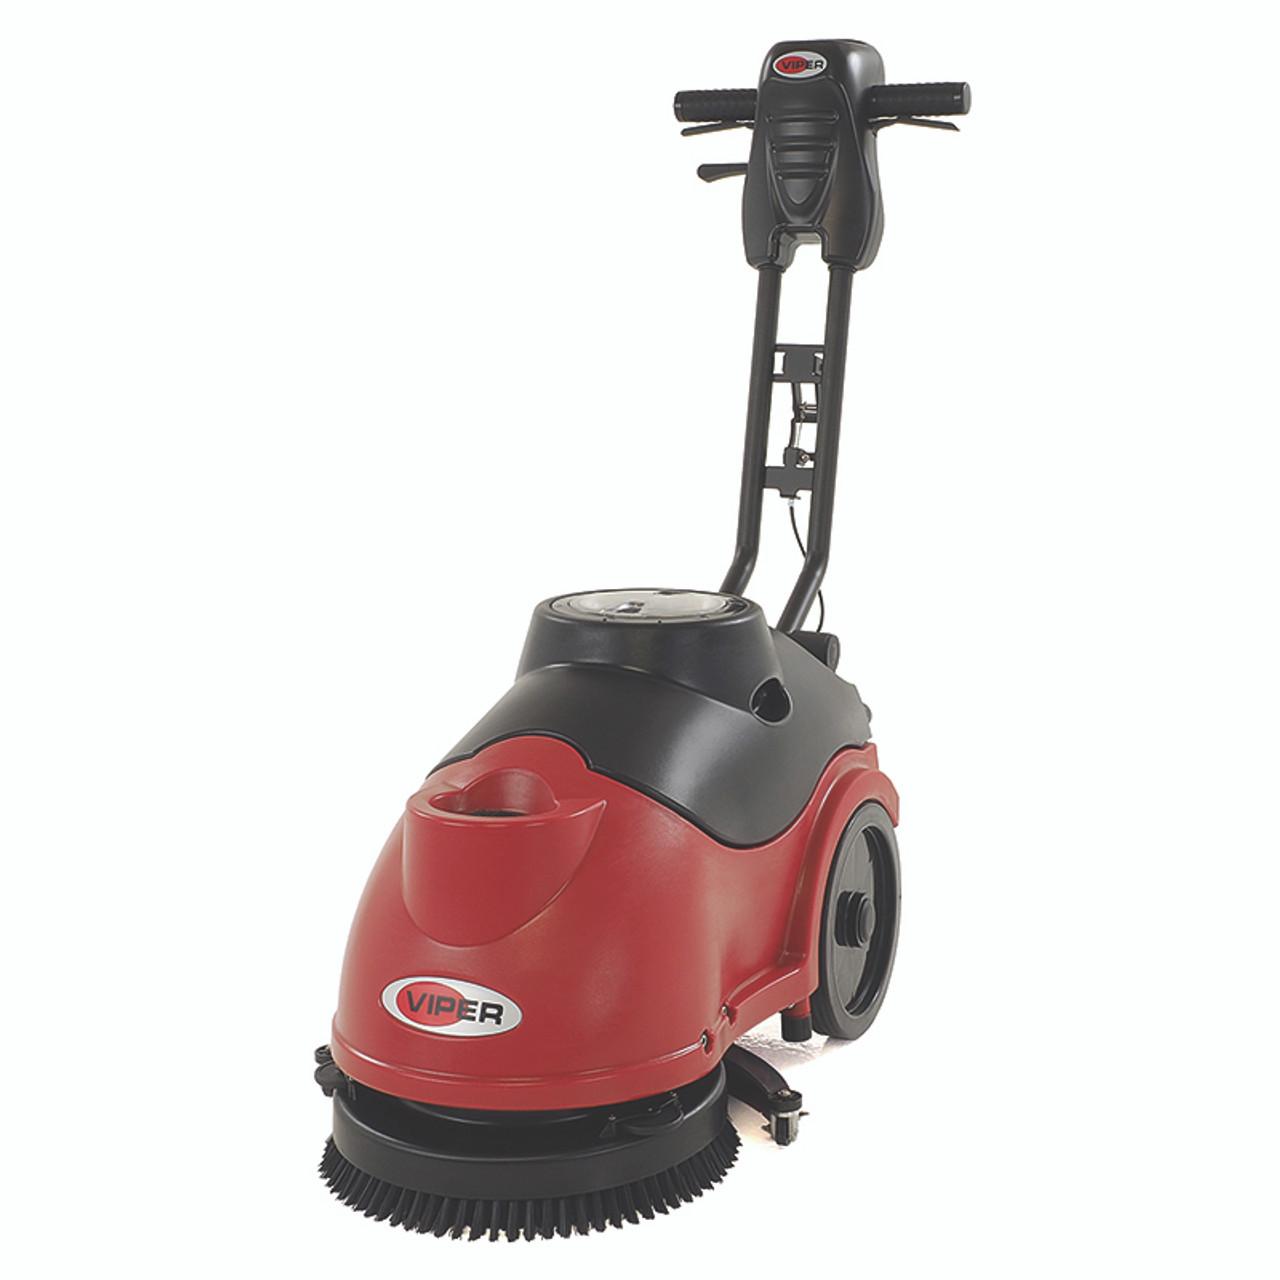 Viper FANGB Floor Scrubber Battery Powered Inch Gal - Battery powered scrub brush